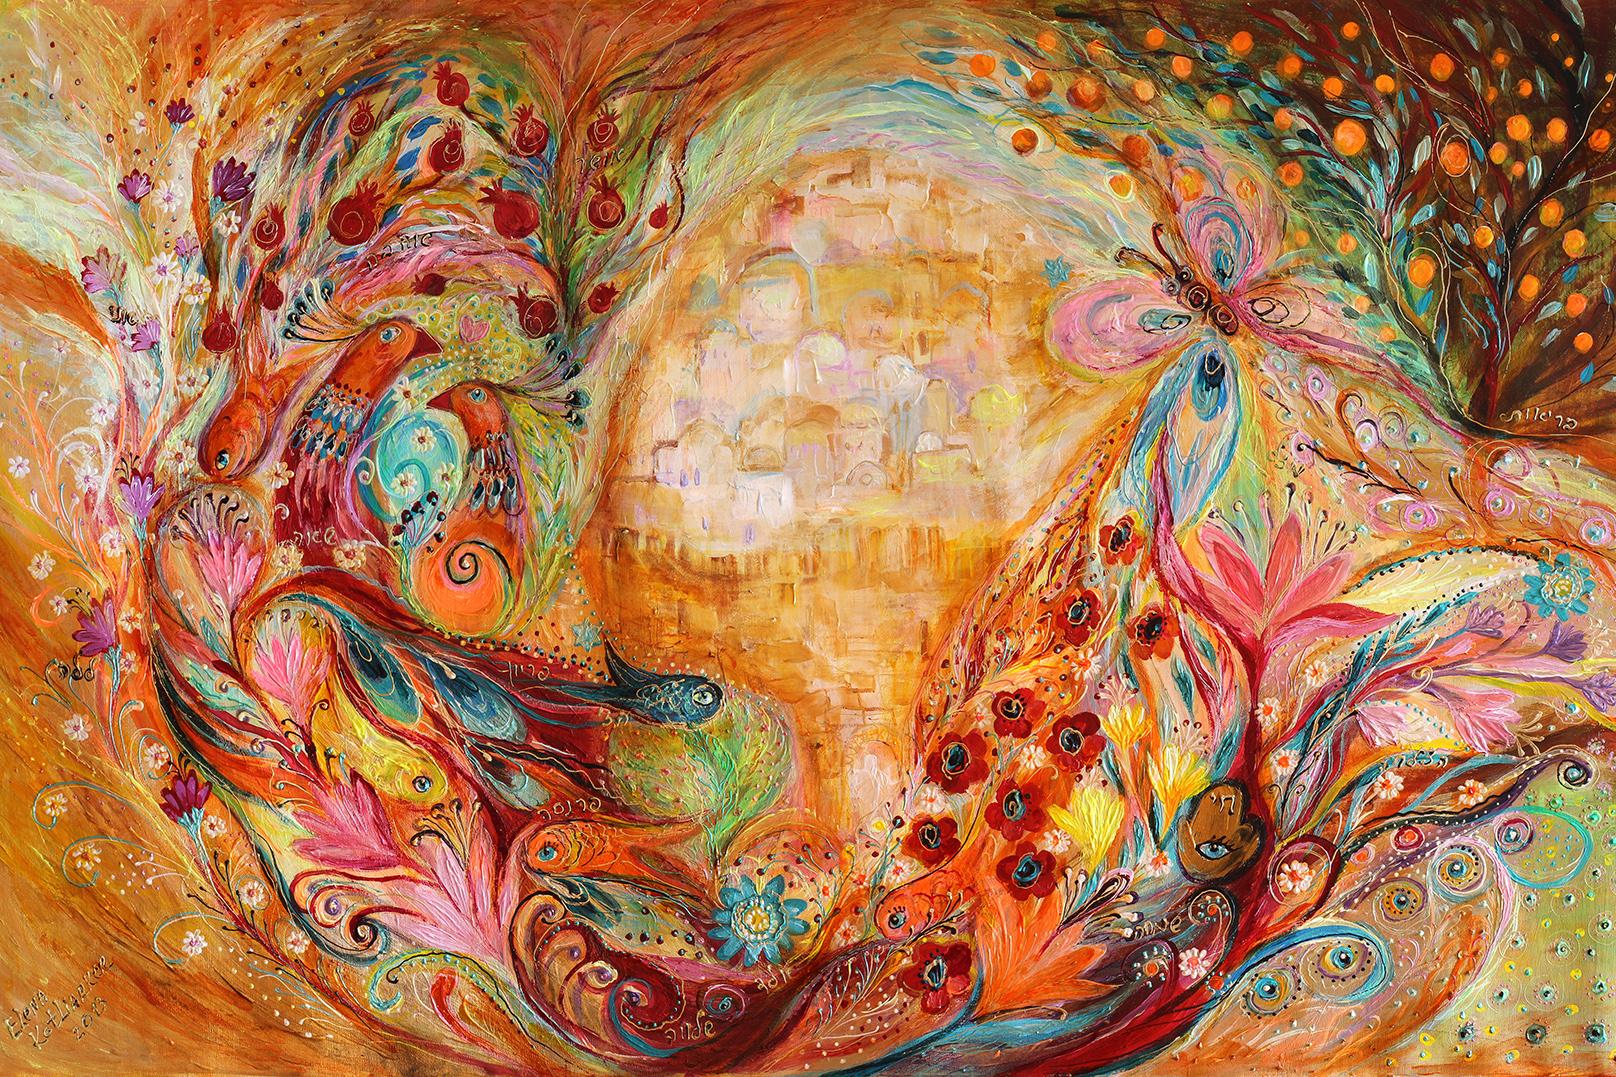 The shining of Jerusalem | Torah Art Gallery